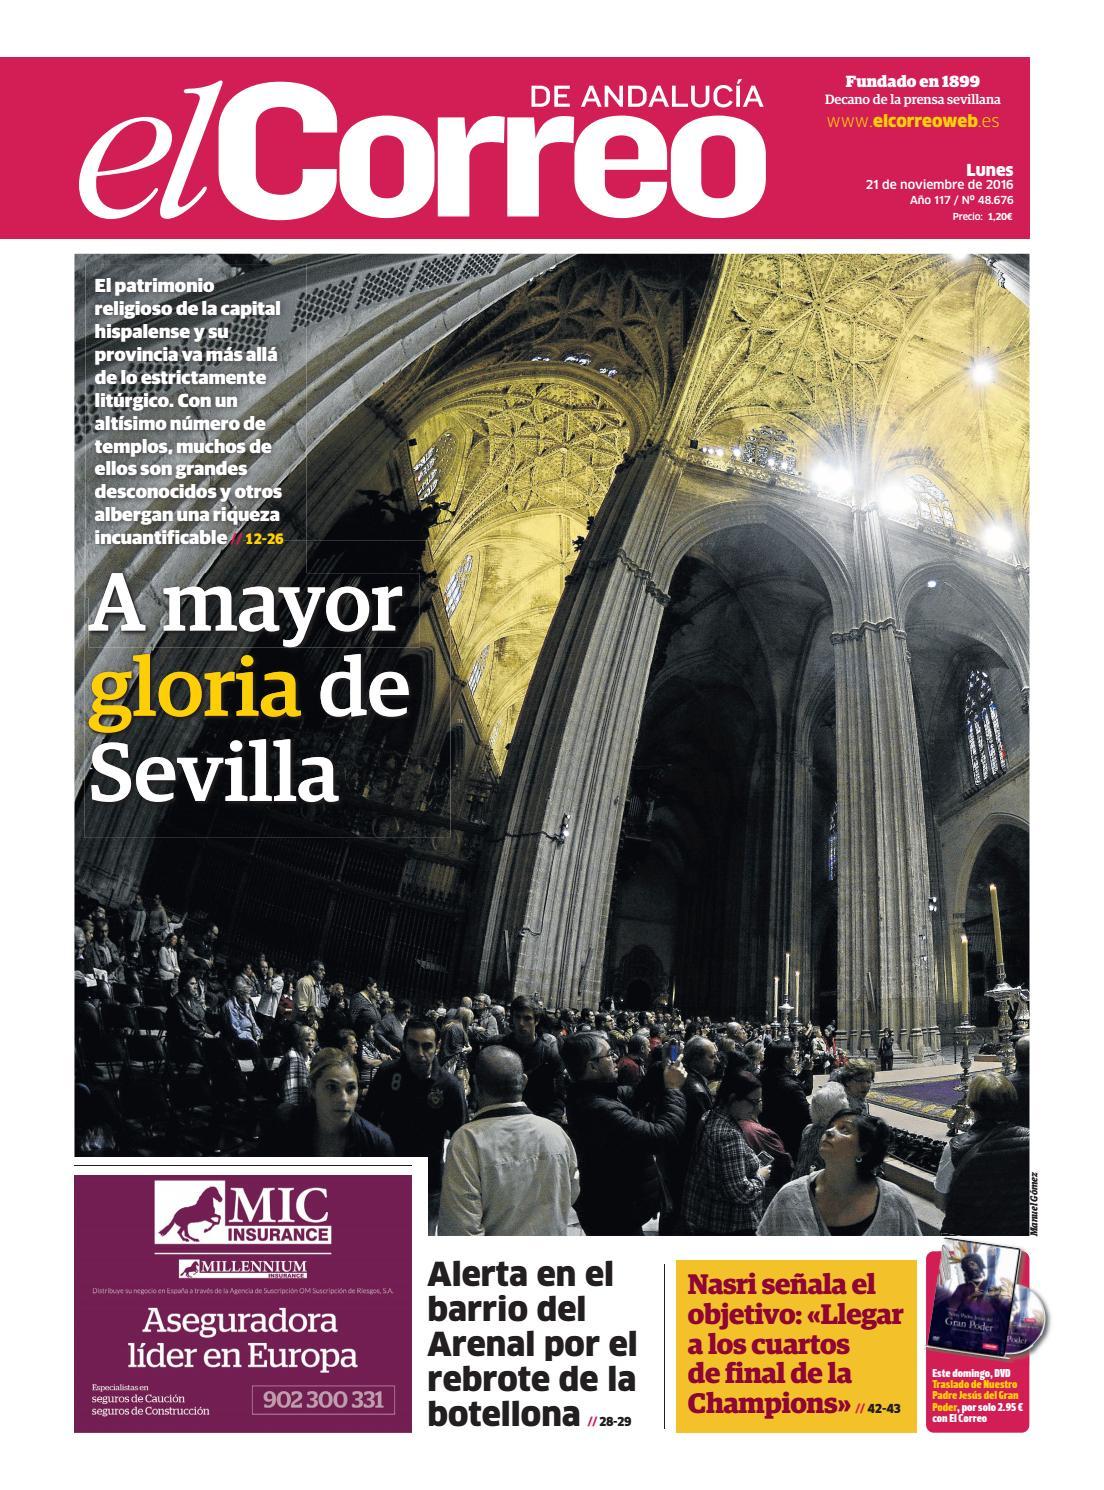 21 11 2016 El Correo de Andalucía by EL CORREO DE ANDALUCÍA S.L. - issuu 20c2f49f37a